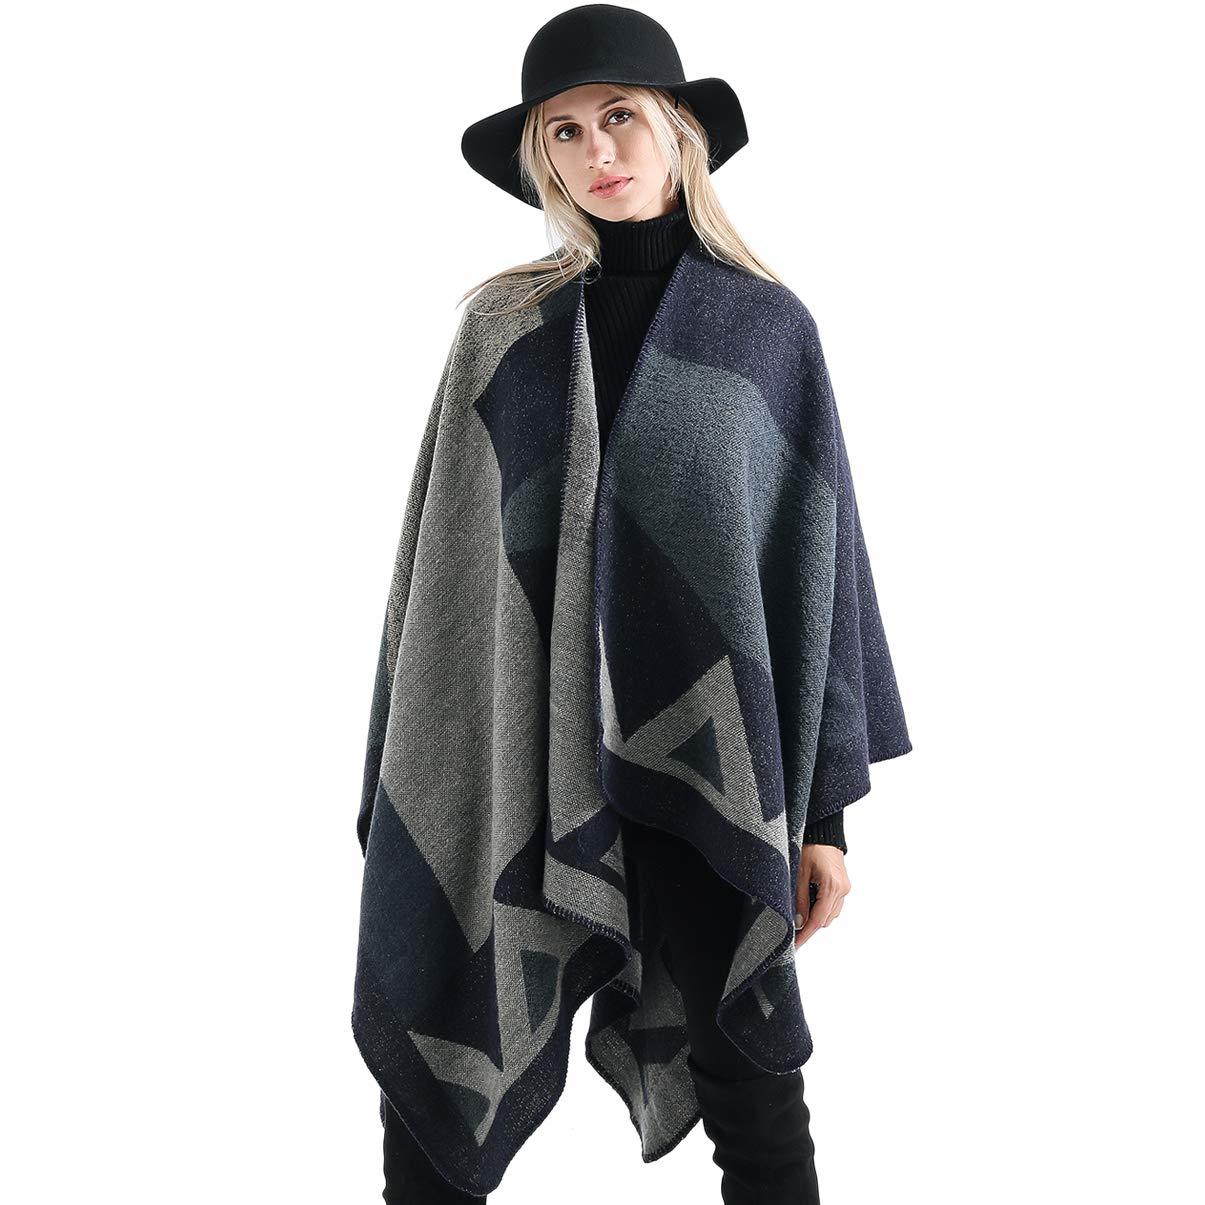 Vbiger Damen Poncho Schal Wrap Farbblock Open Front Cape Übergroße Winterdecke Reversible Schal Dicke Cardigan Coat, Navy